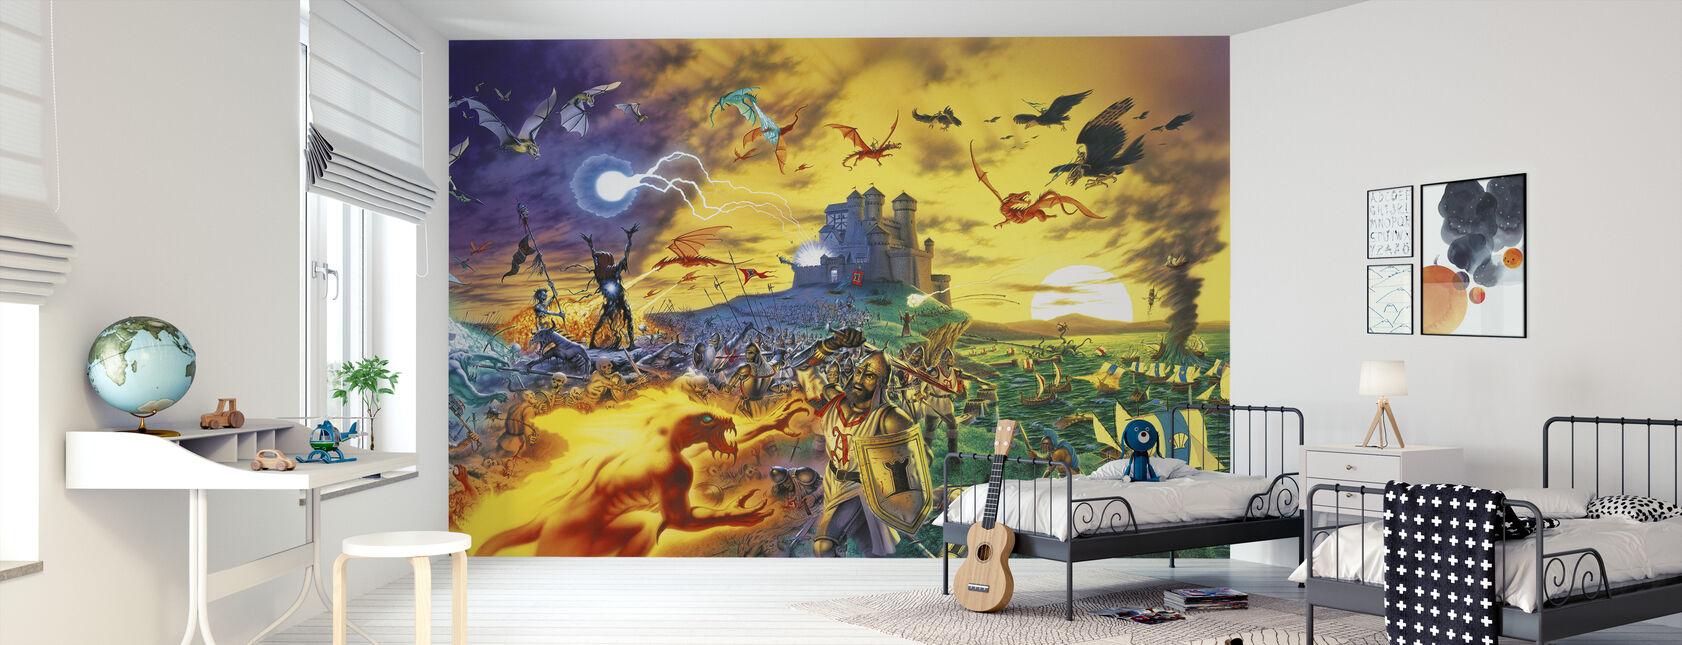 Fantasy Battle - Behang - Kinderkamer